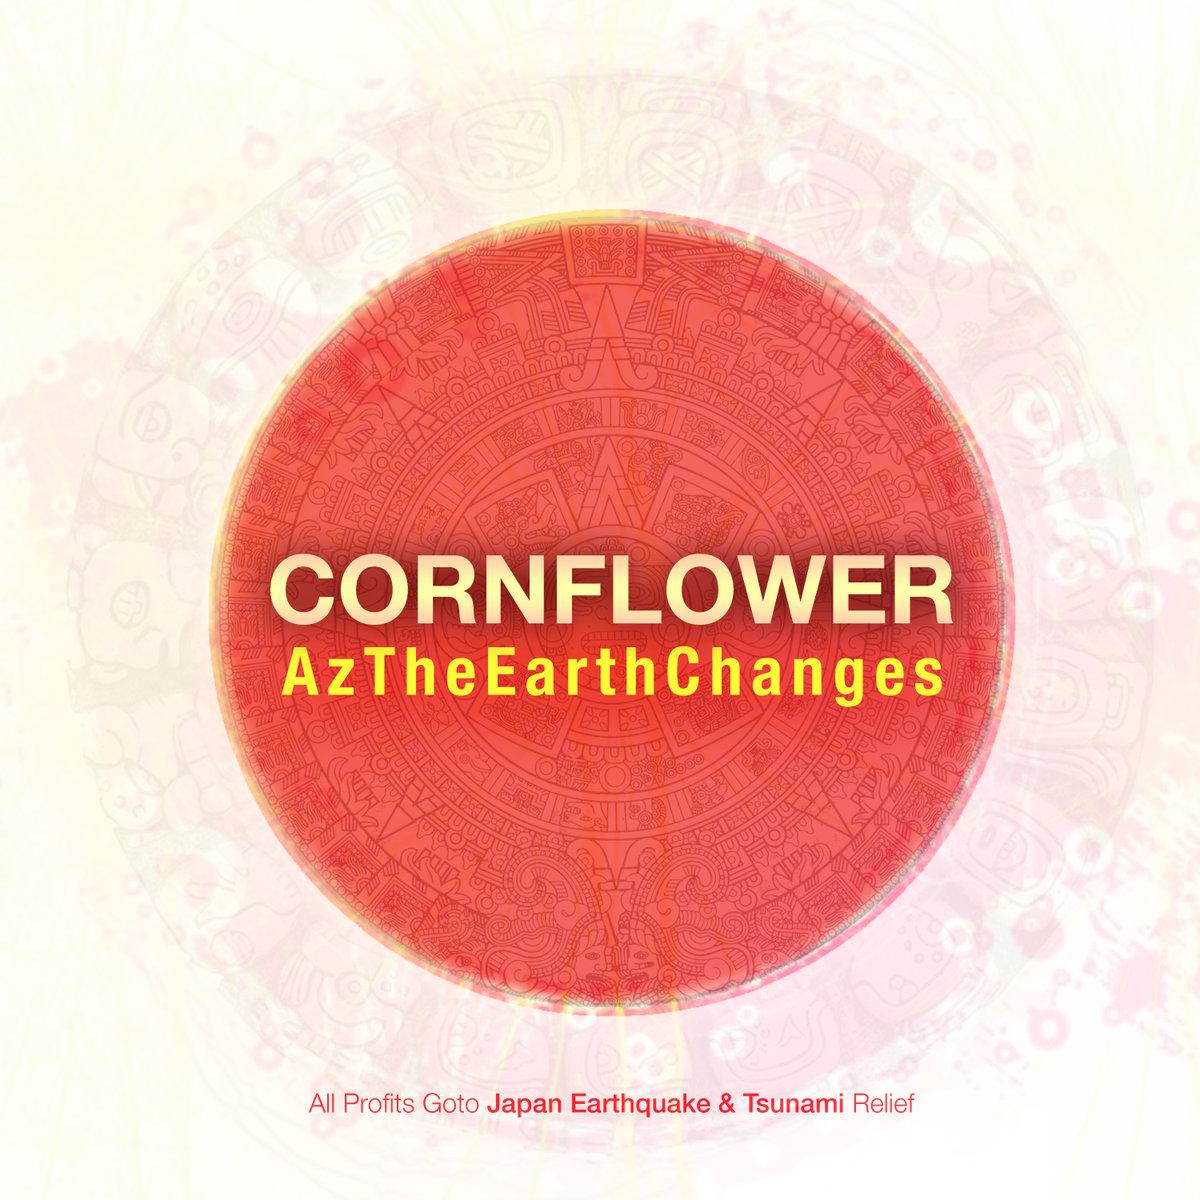 CF-AzTheEarthChanges-001